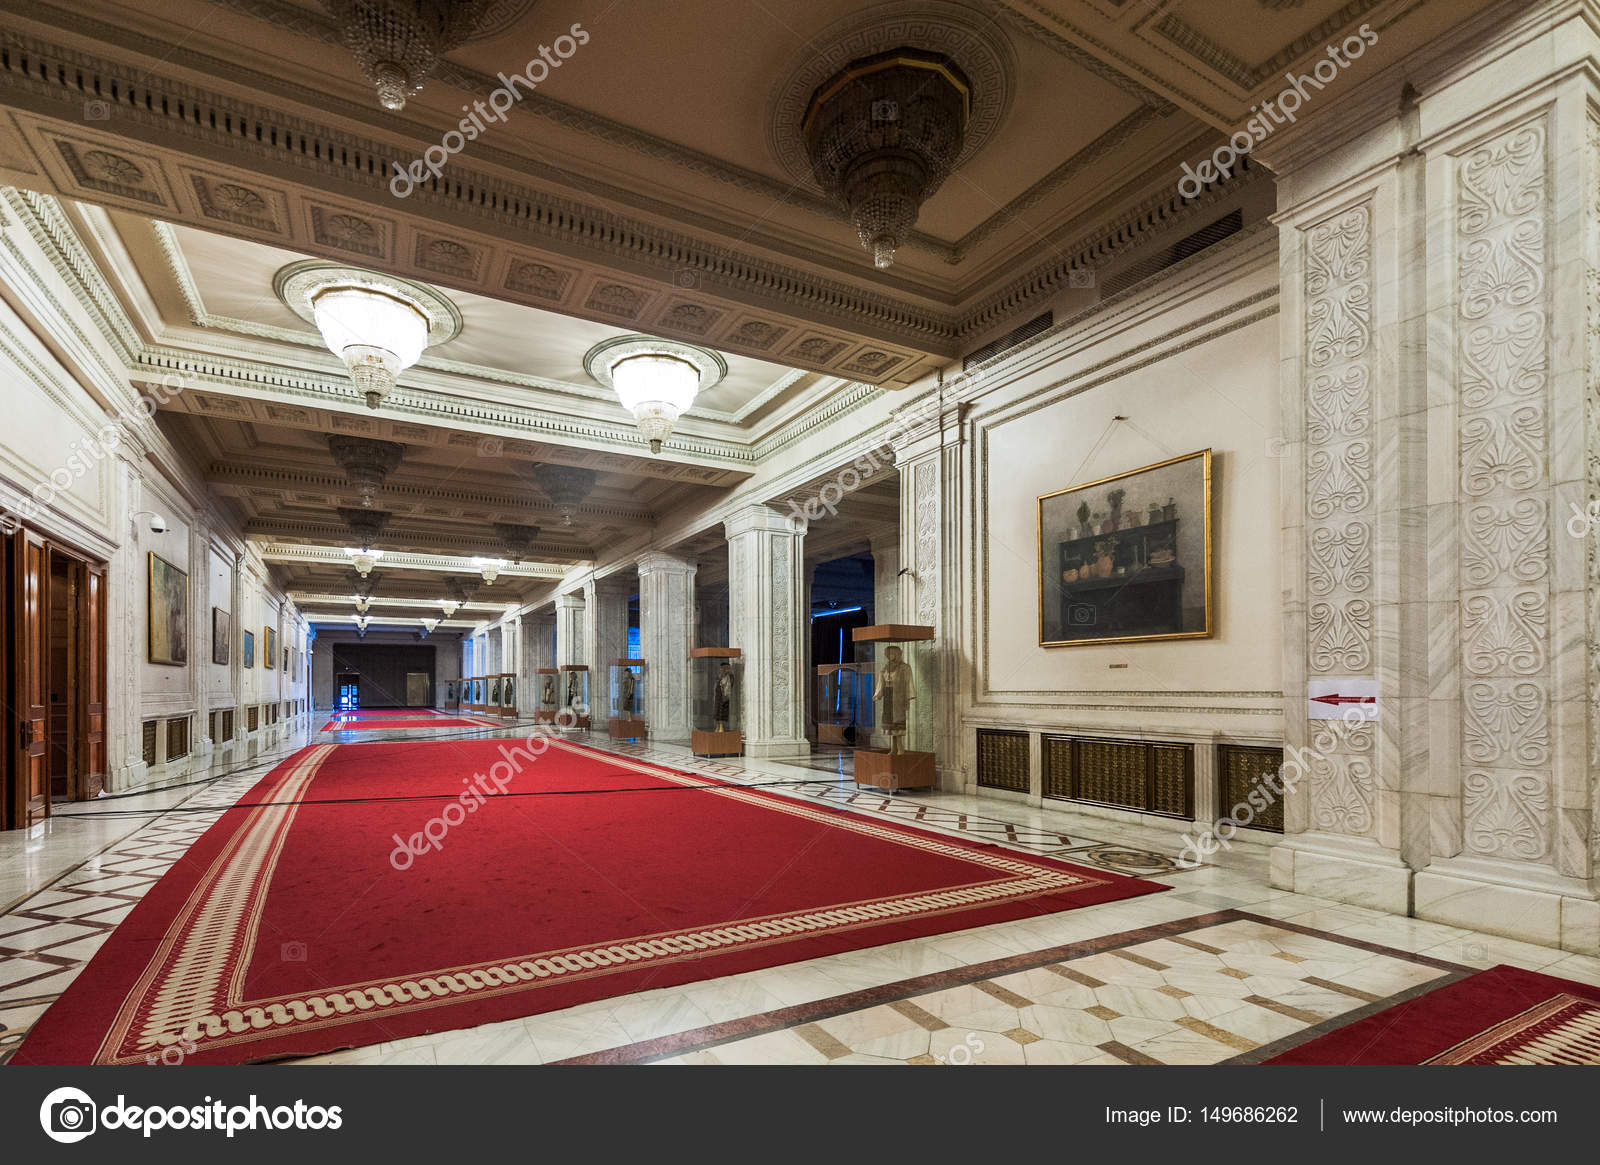 https://st3.depositphotos.com/1076880/14968/i/1600/depositphotos_149686262-stock-photo-bucharest-romania-march-22-interior.jpg